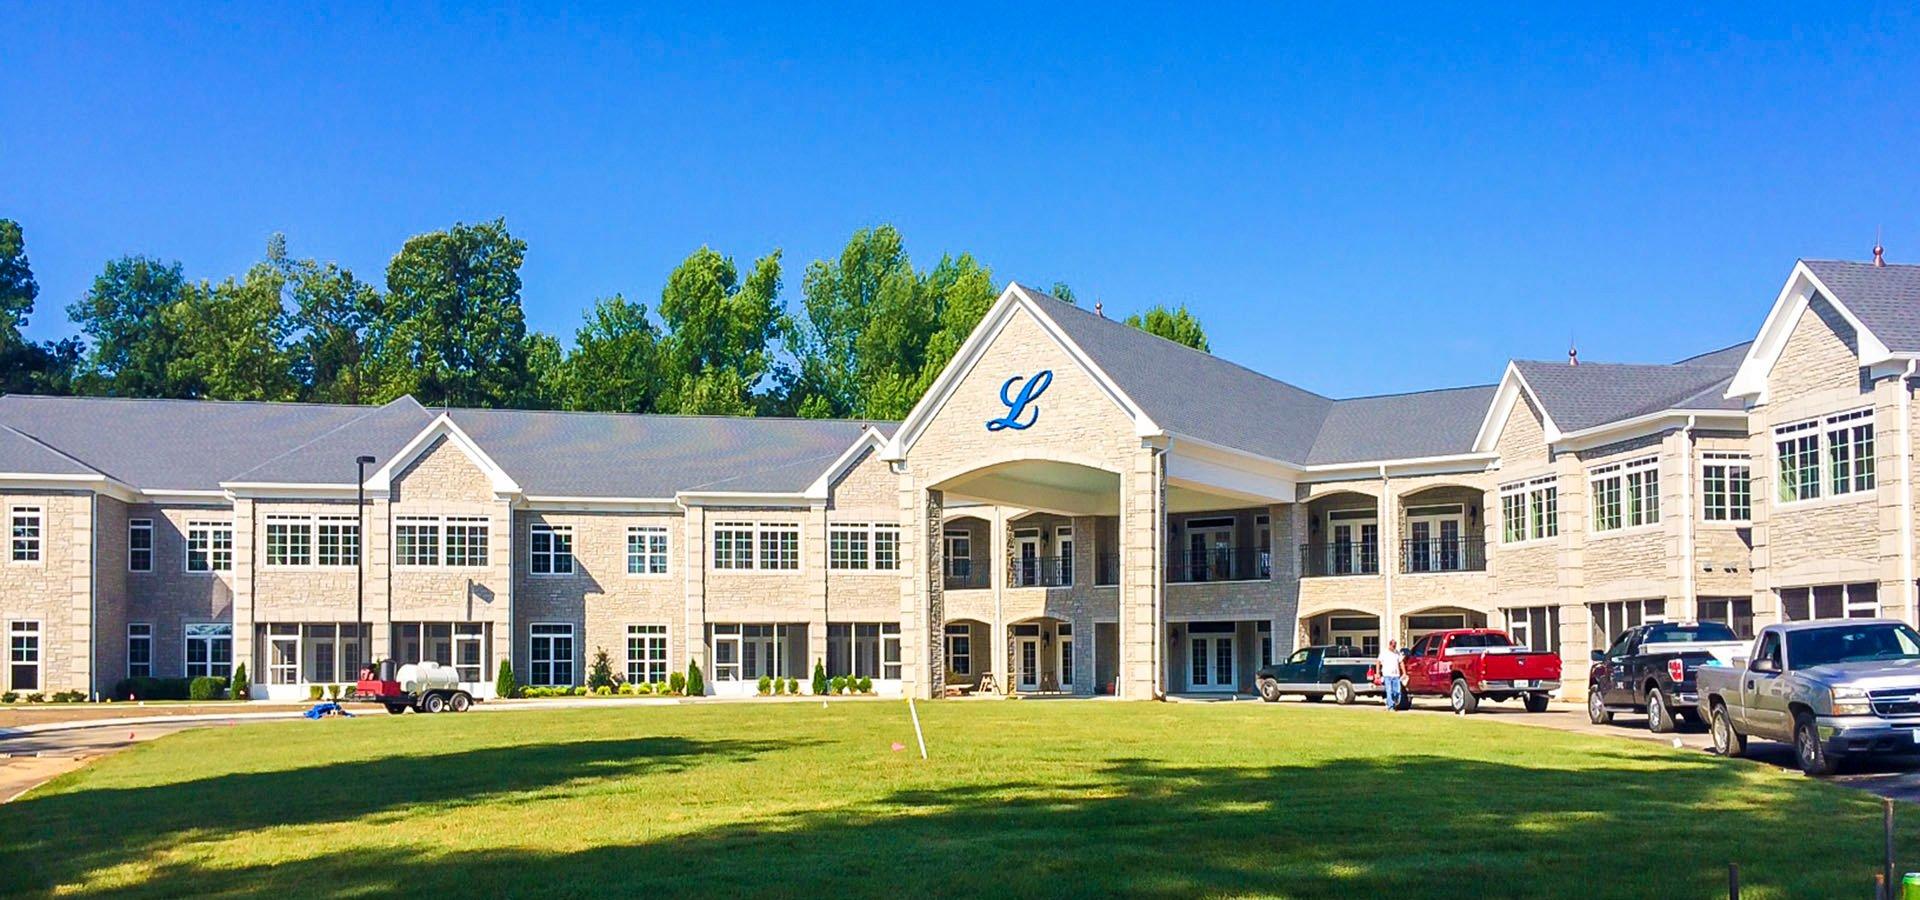 The Lakes of Paducah | Paducah, Kentucky | Brindley Construction, LLC.